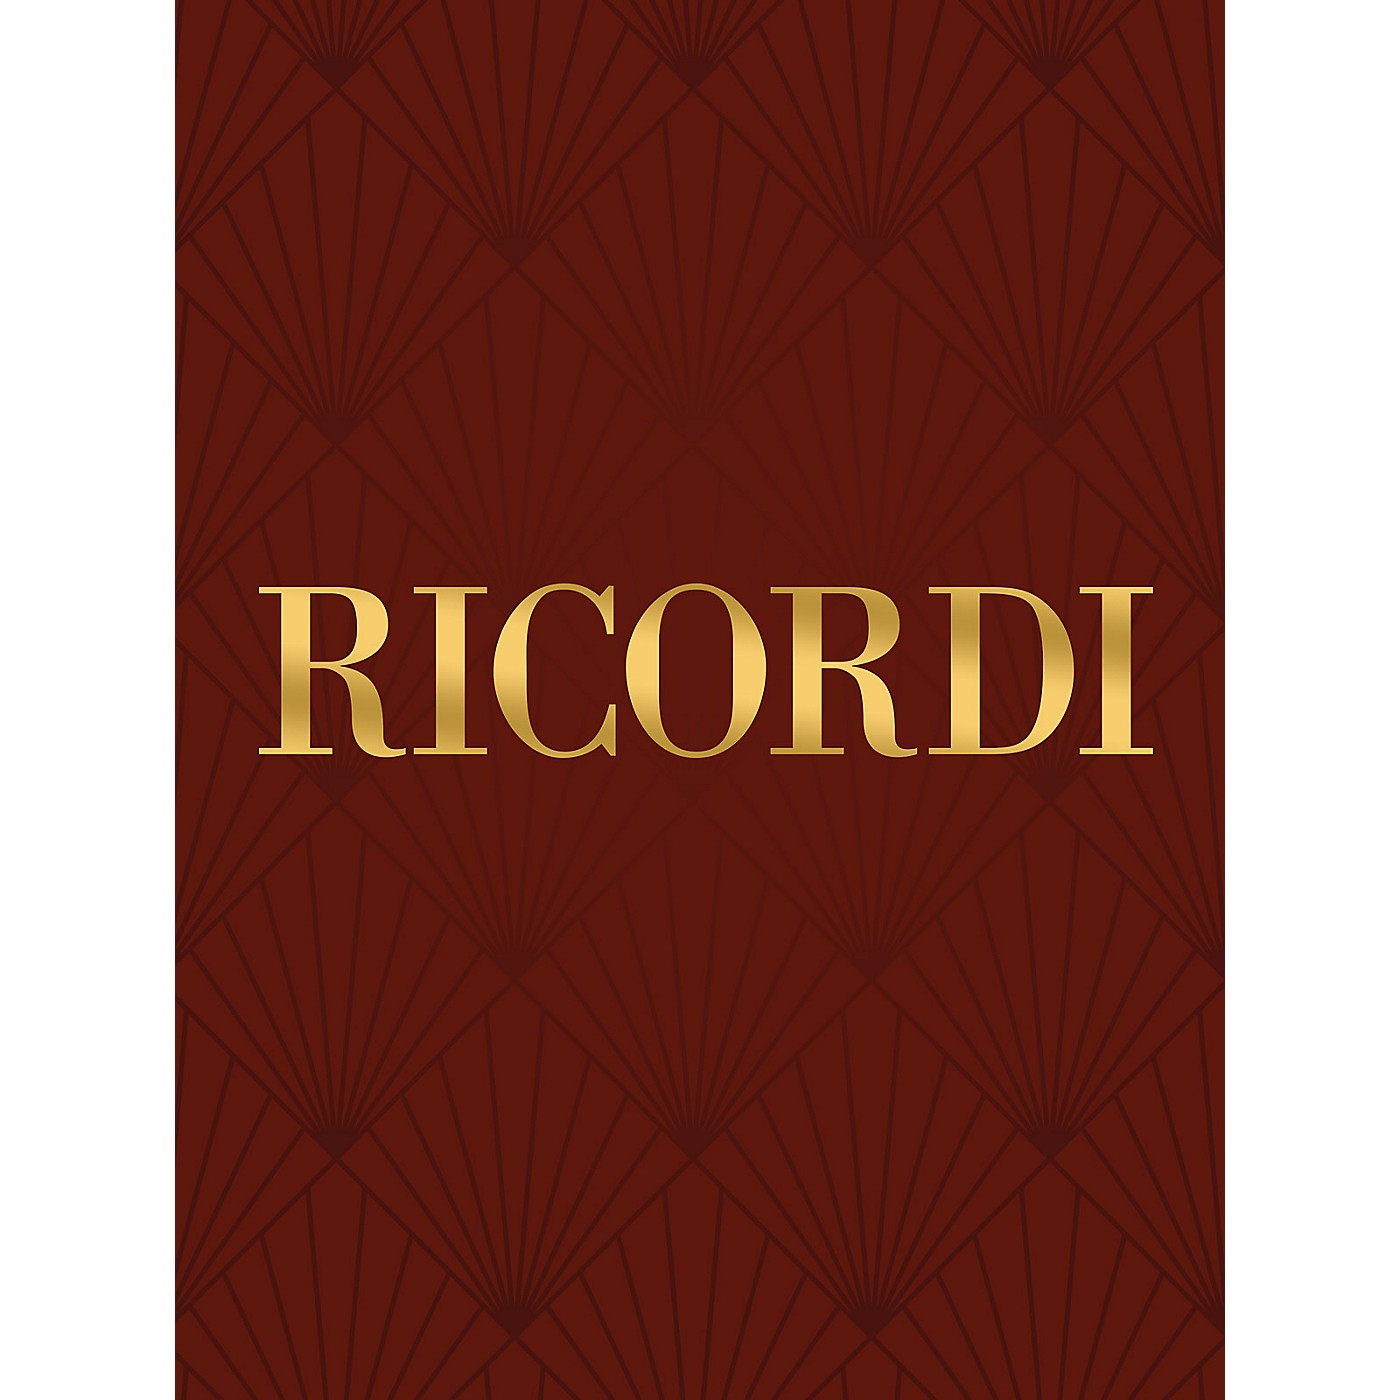 Ricordi Parigi O Cara from La Traviata Soprano/tenor, It (Vocal Solo) Vocal Ensemble Series by Giuseppe Verdi thumbnail